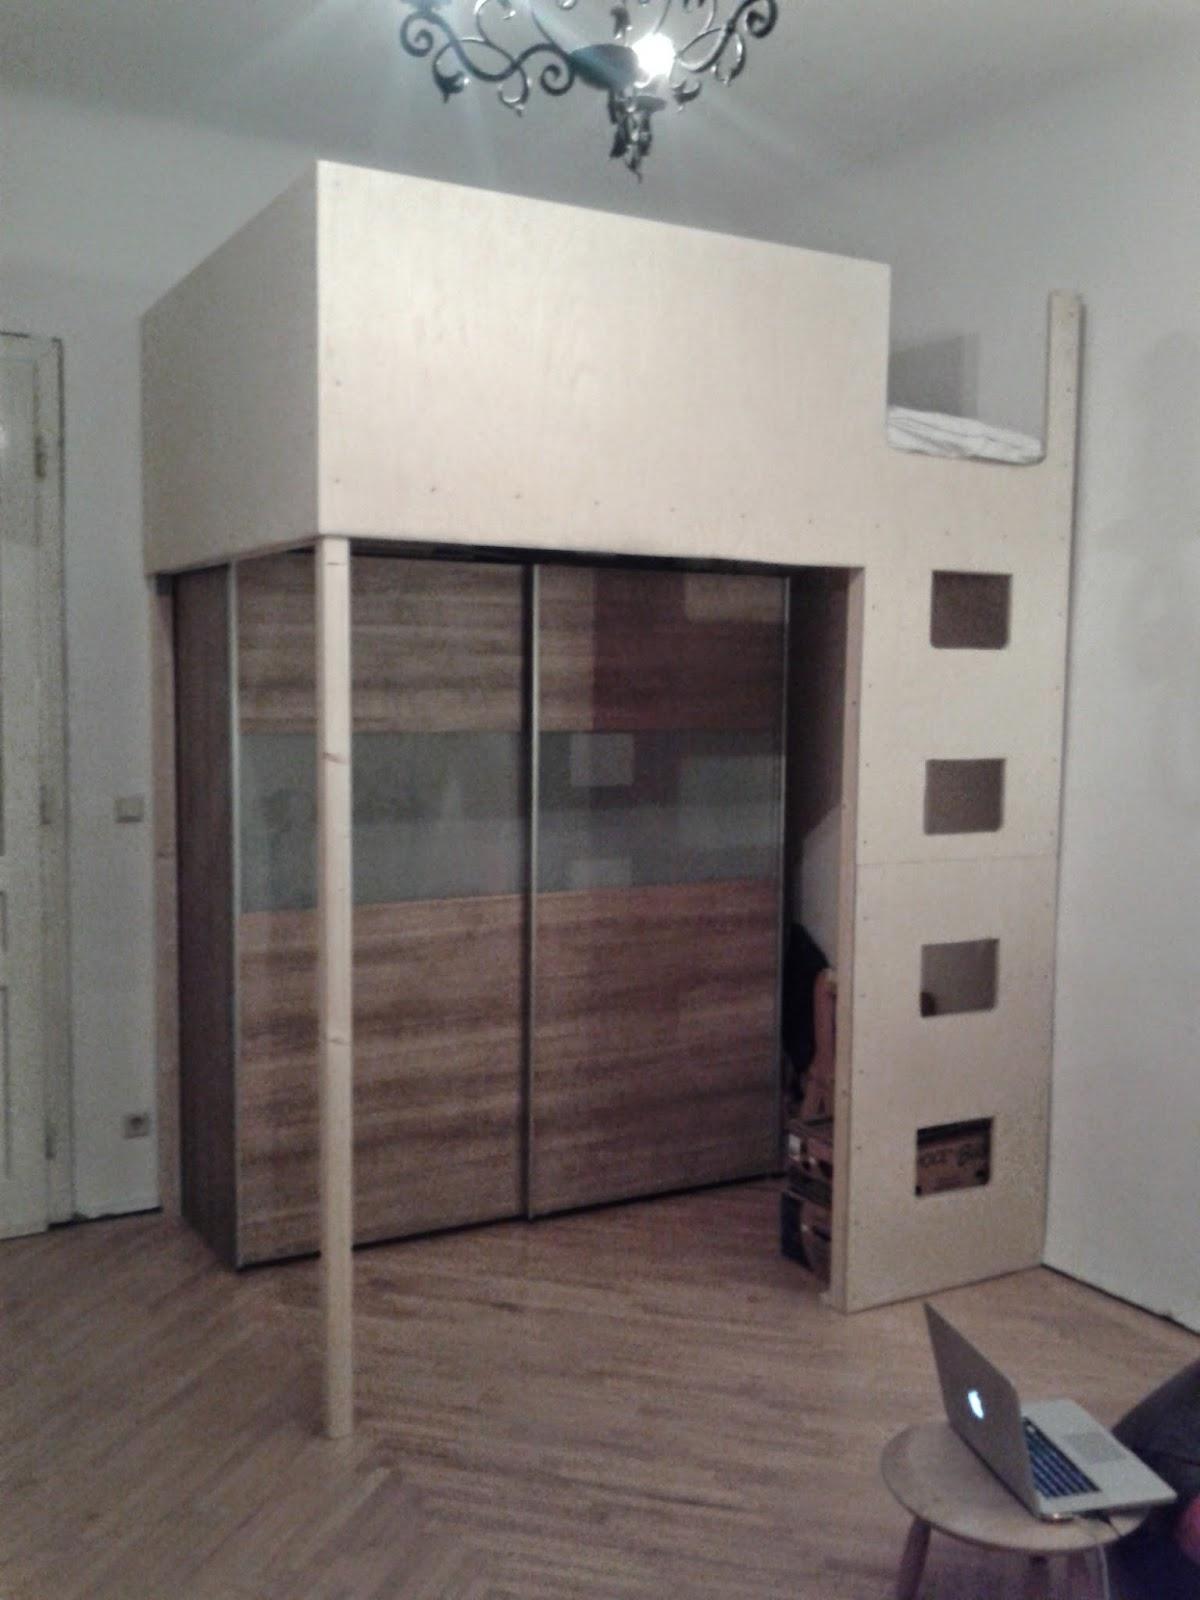 fuck yeah basteln hochbett. Black Bedroom Furniture Sets. Home Design Ideas